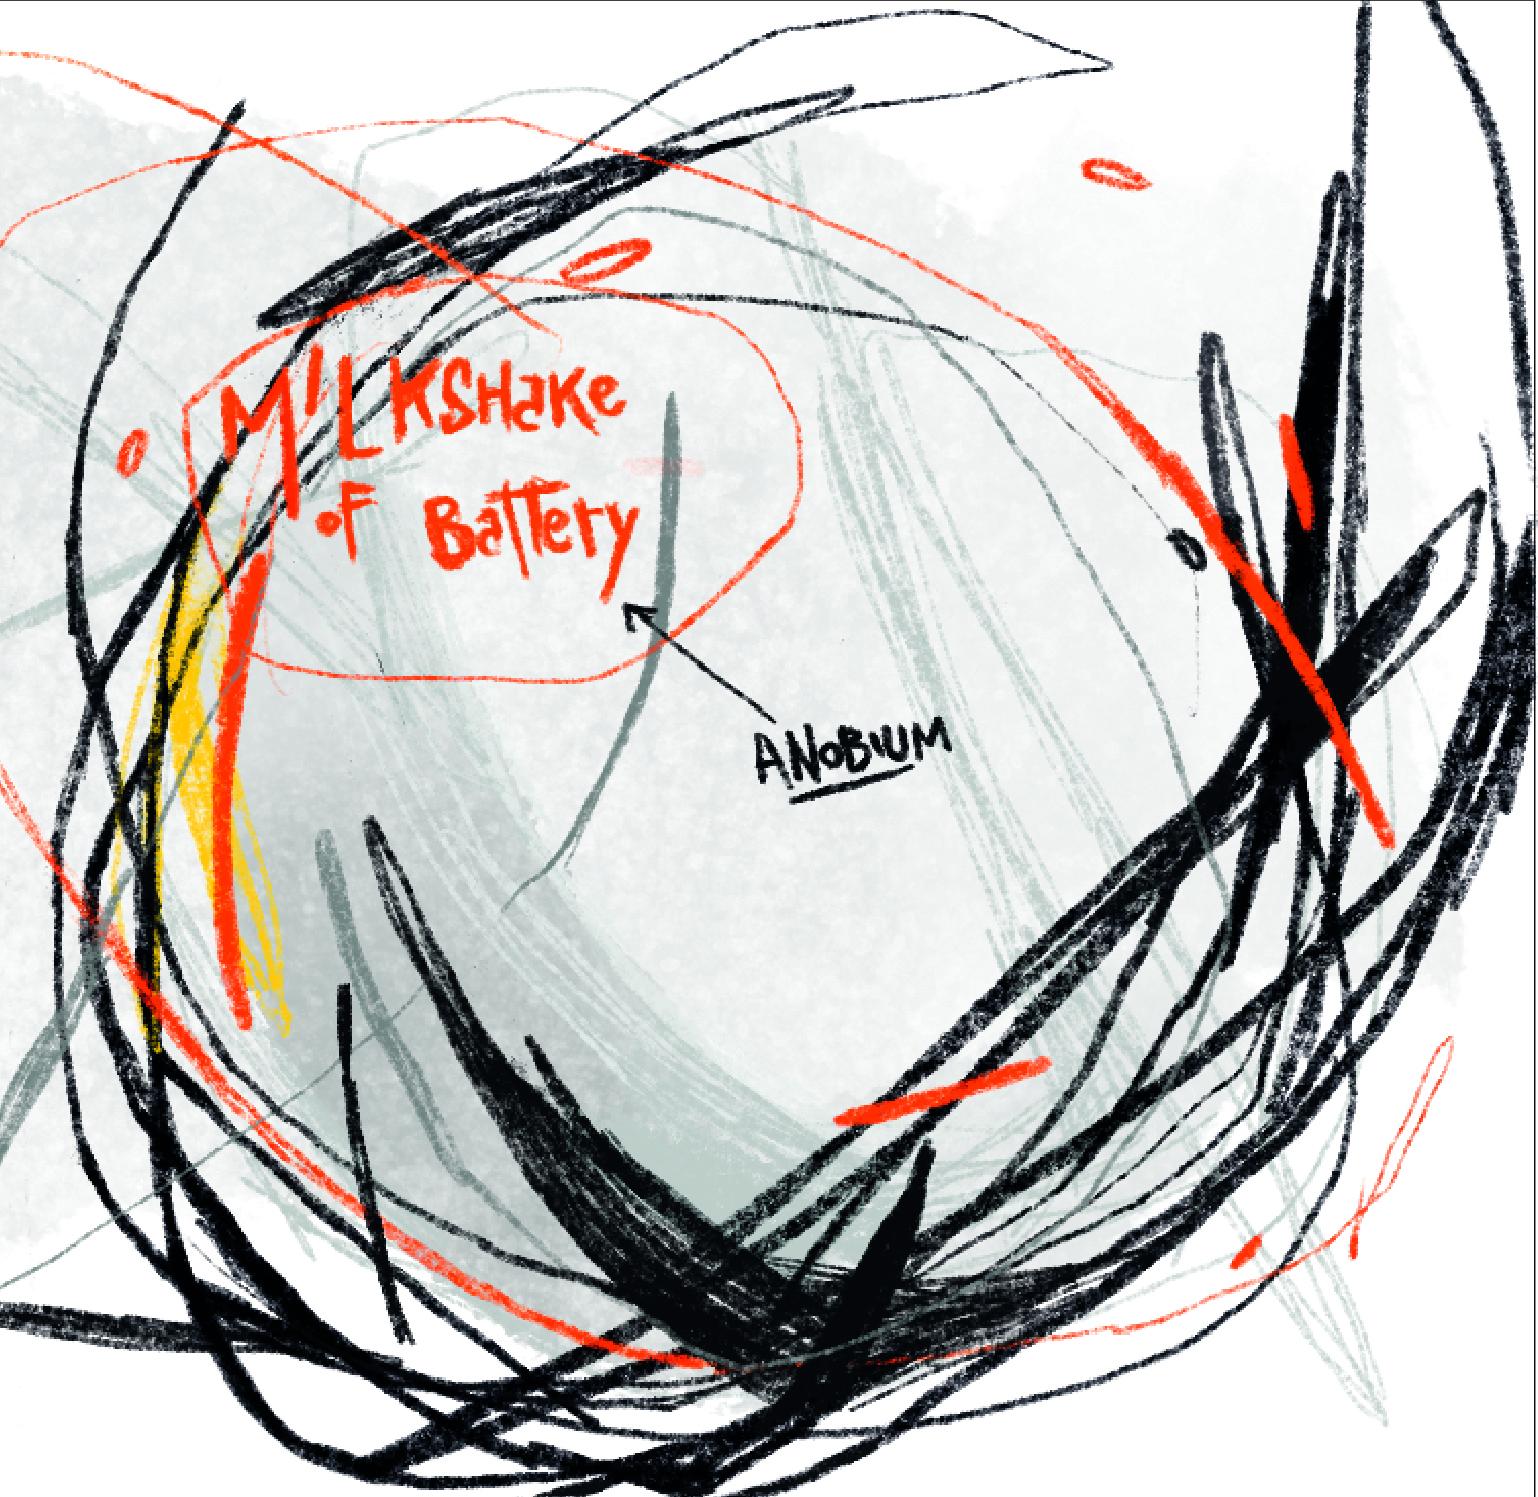 https://soundcloud.com/burla22Milkshake of Battery -